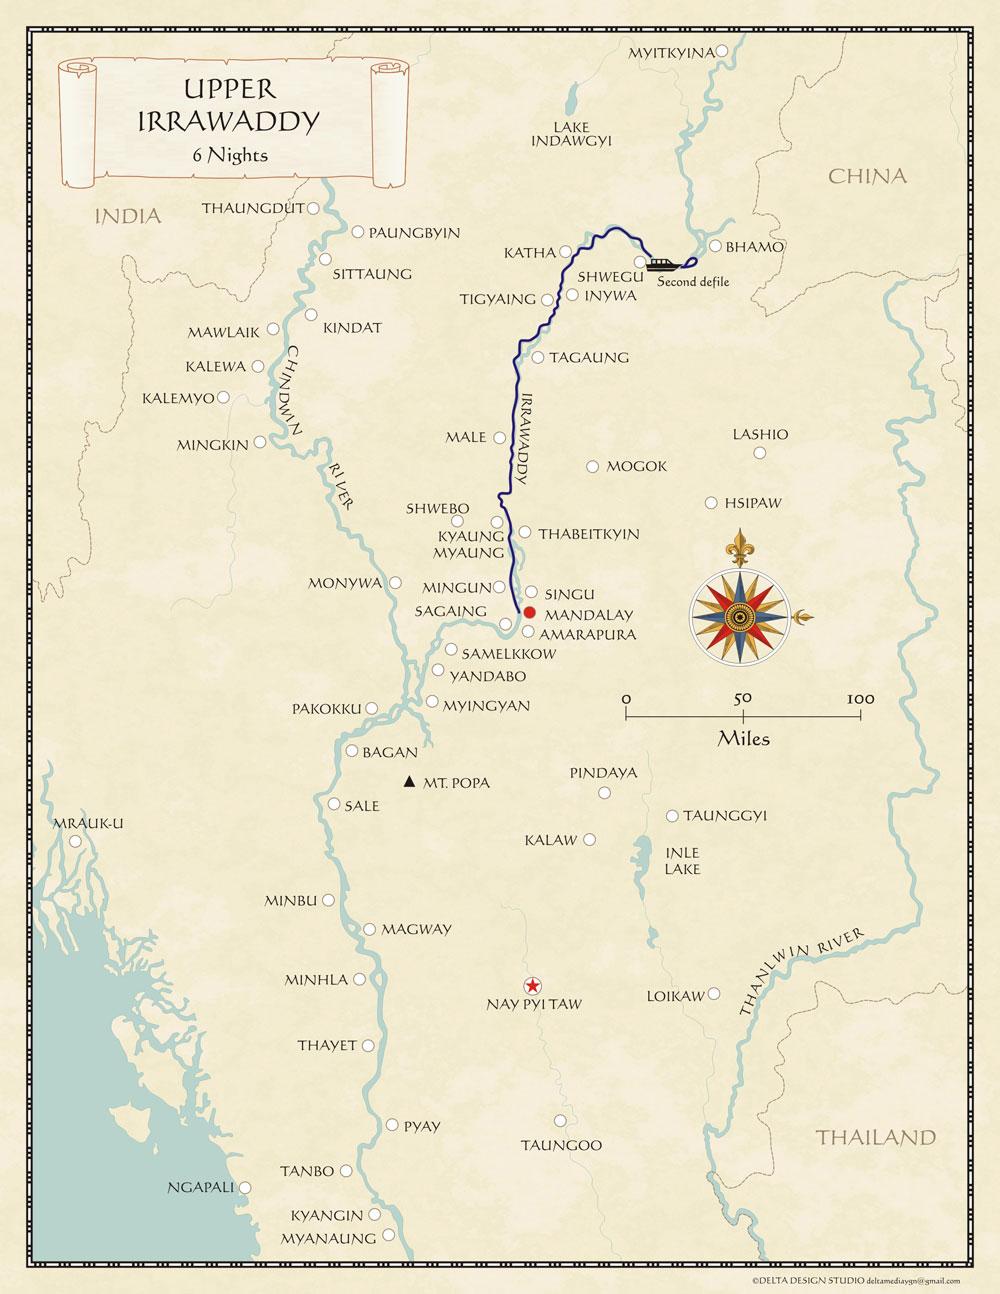 Upper Irrawaddy Myanmar Cruise Map